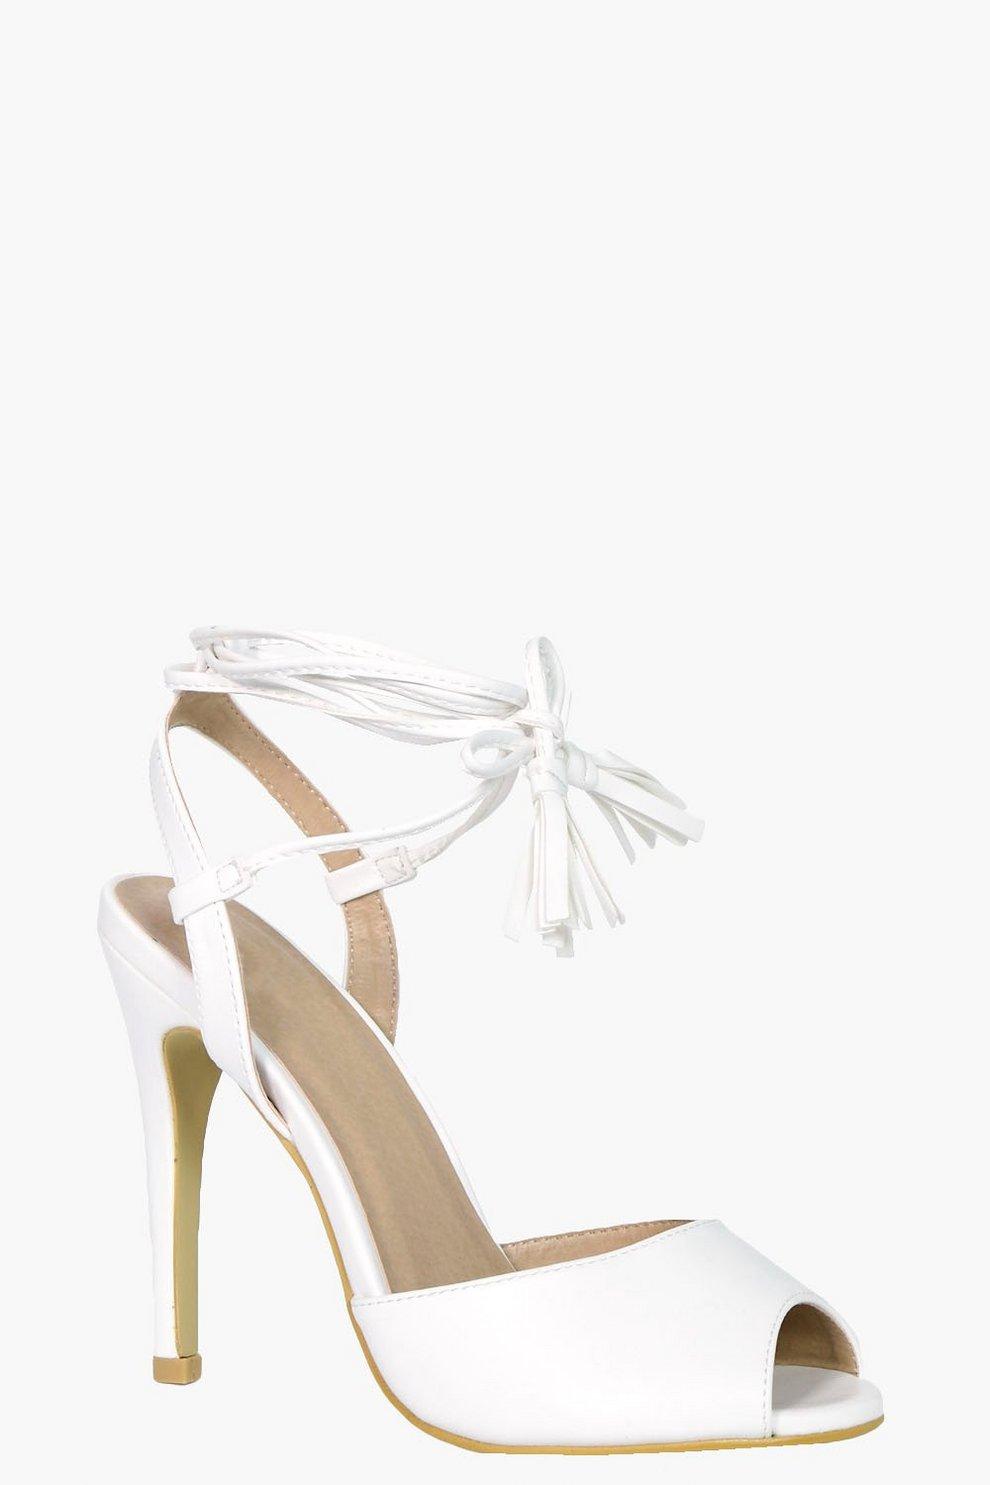 649e43f93fd1 Womens White Ellie Peeptoe Wrap Strap Detail Heels. Hover to zoom